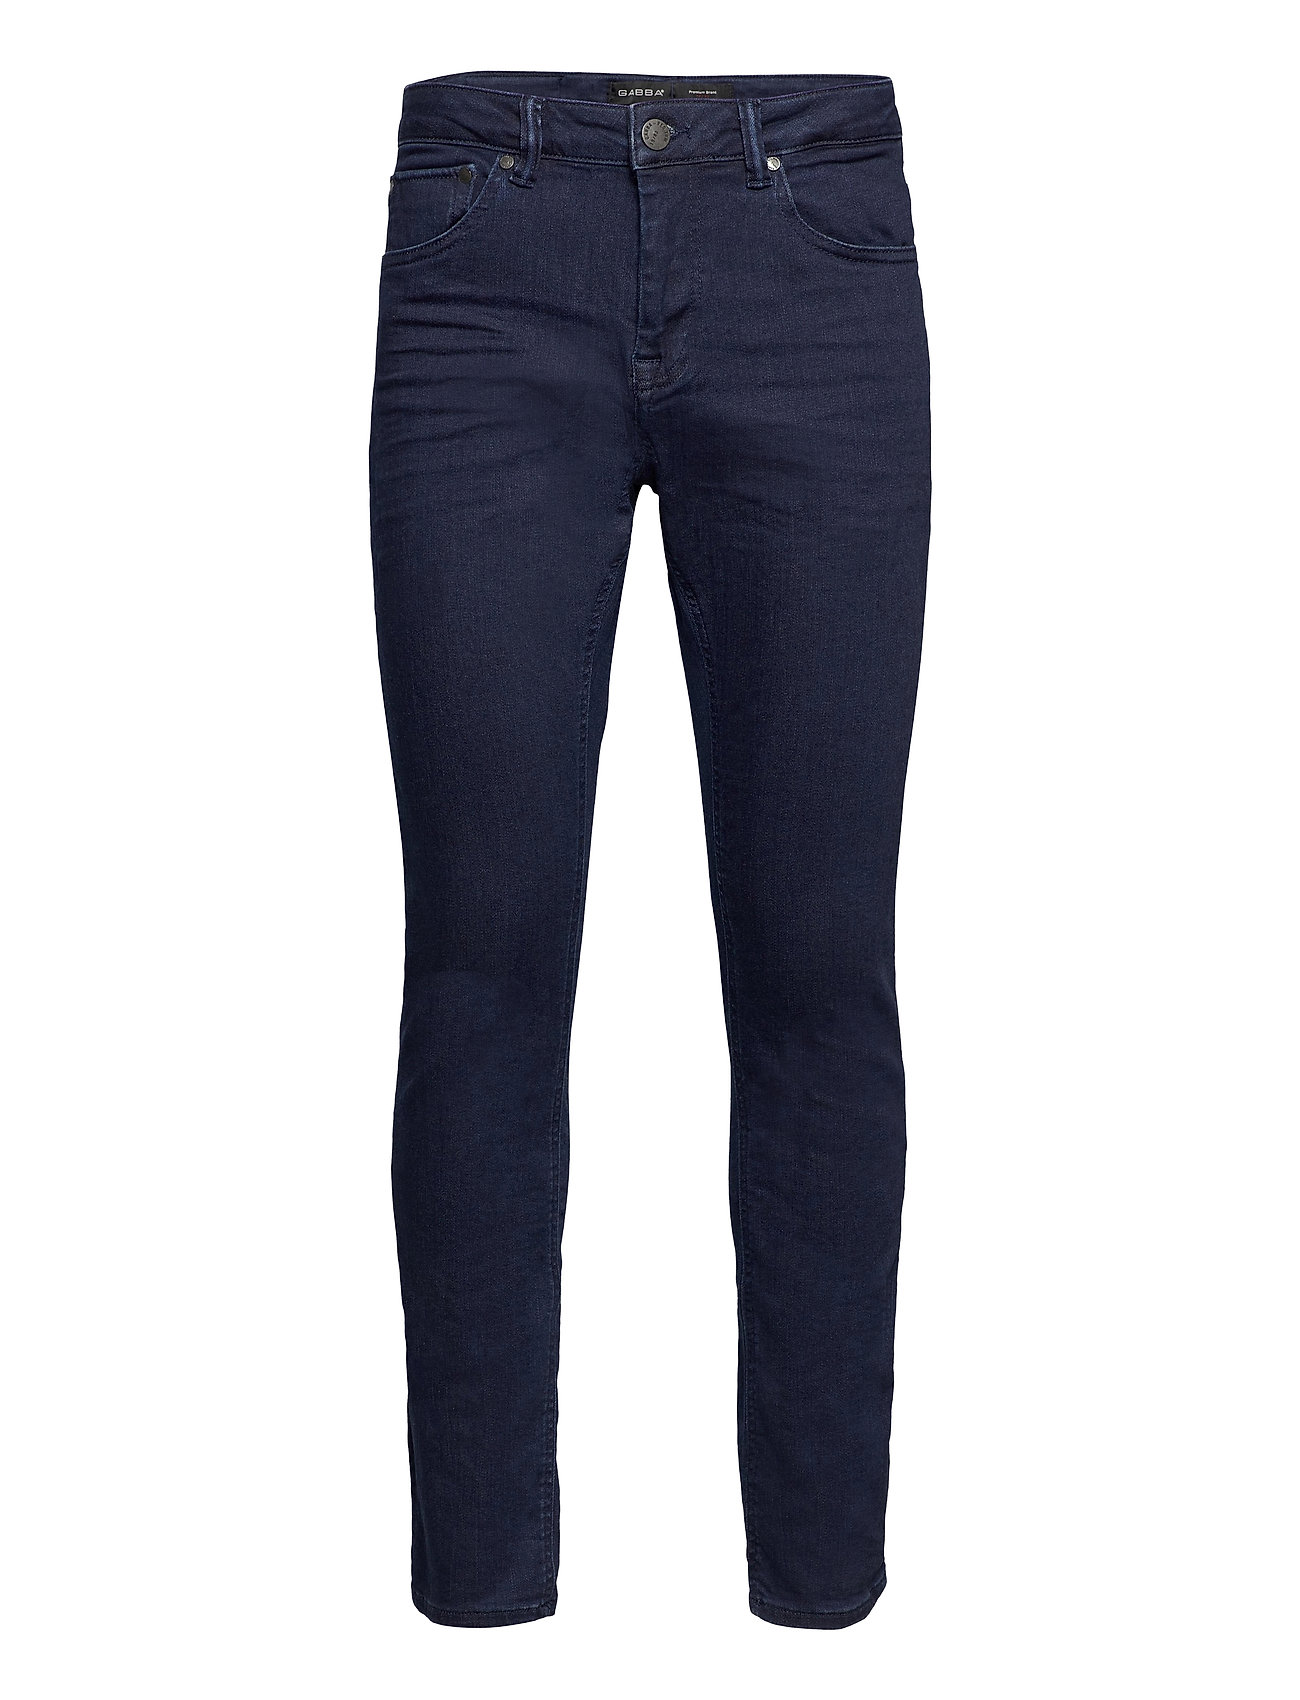 Image of J S K3869 Jeans Slim Jeans Blå Gabba (3488818935)